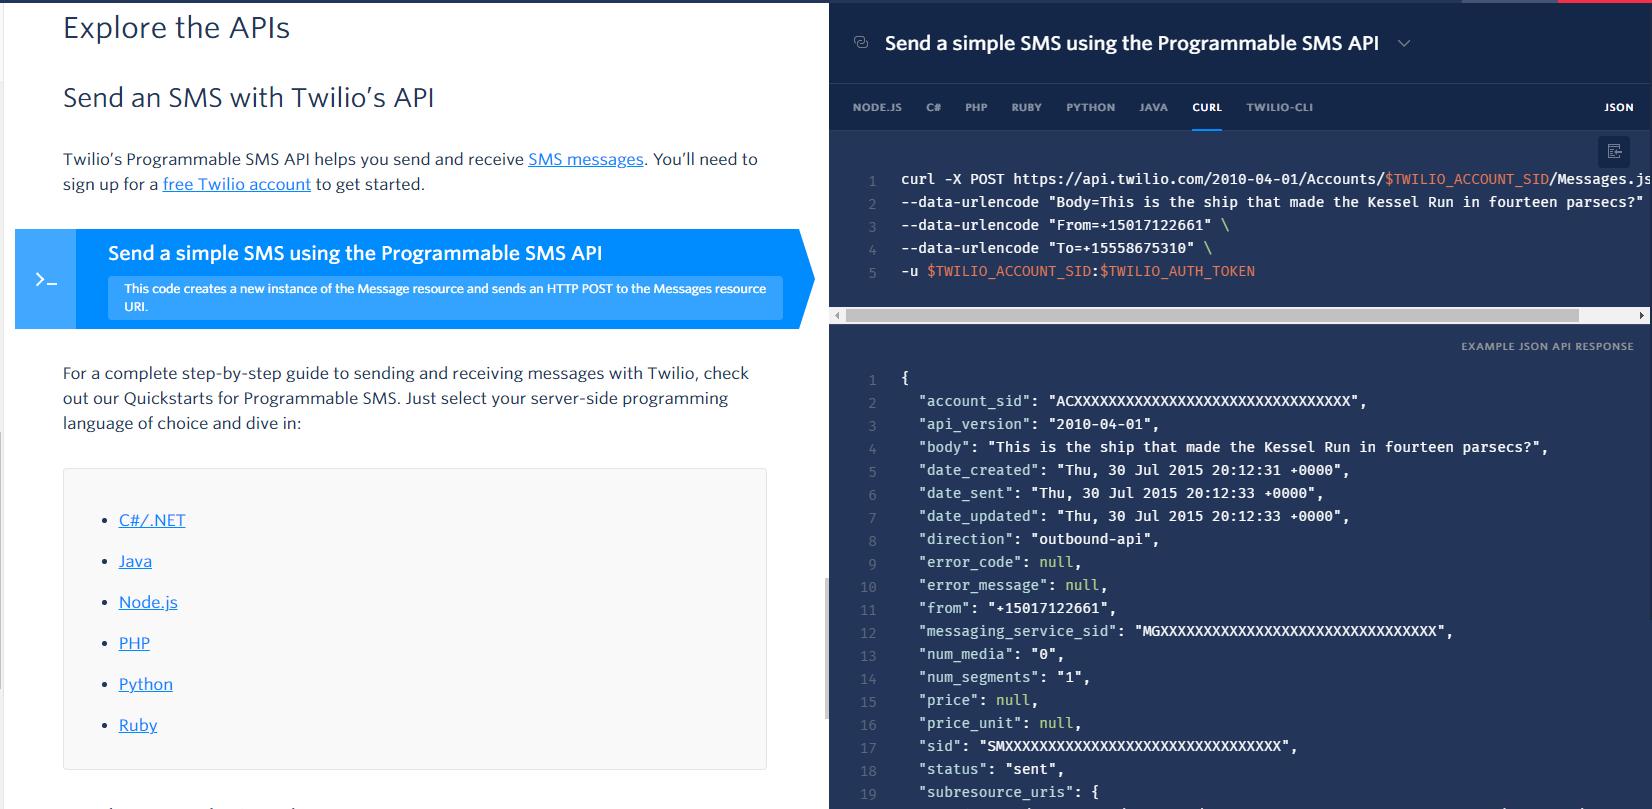 Twilio API documentation